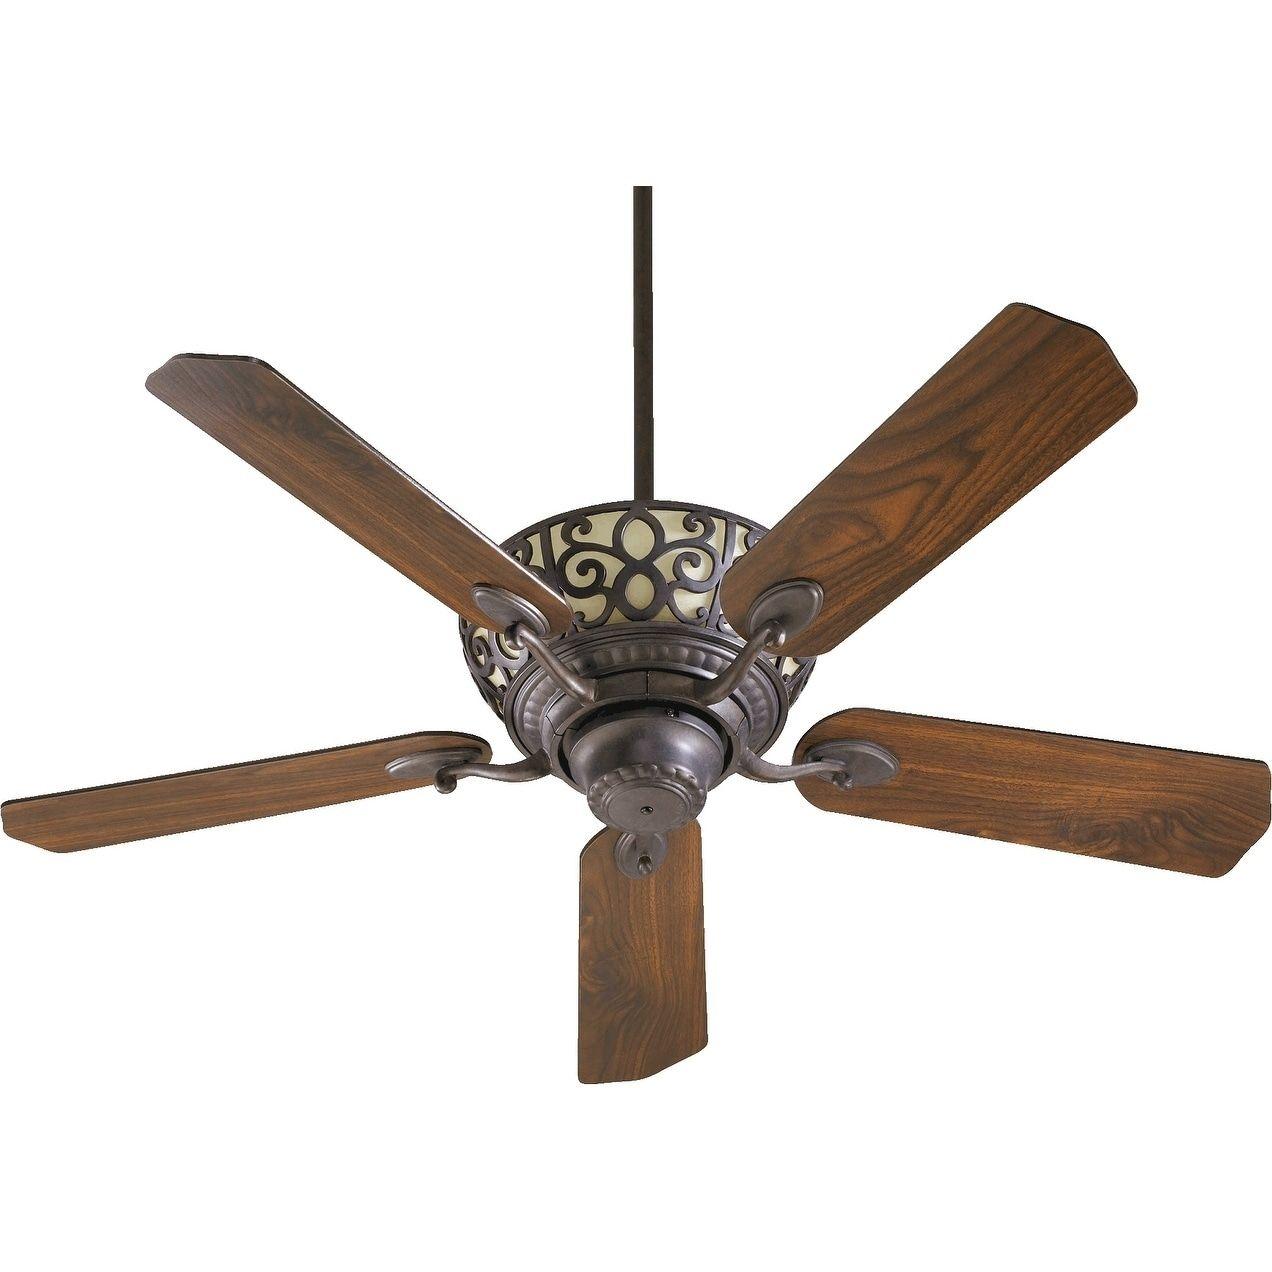 International Cimarron 52 Transitional Ceiling Fan With Integraded Uplight Light Kit Old World Bronze Walnut Blades Wood